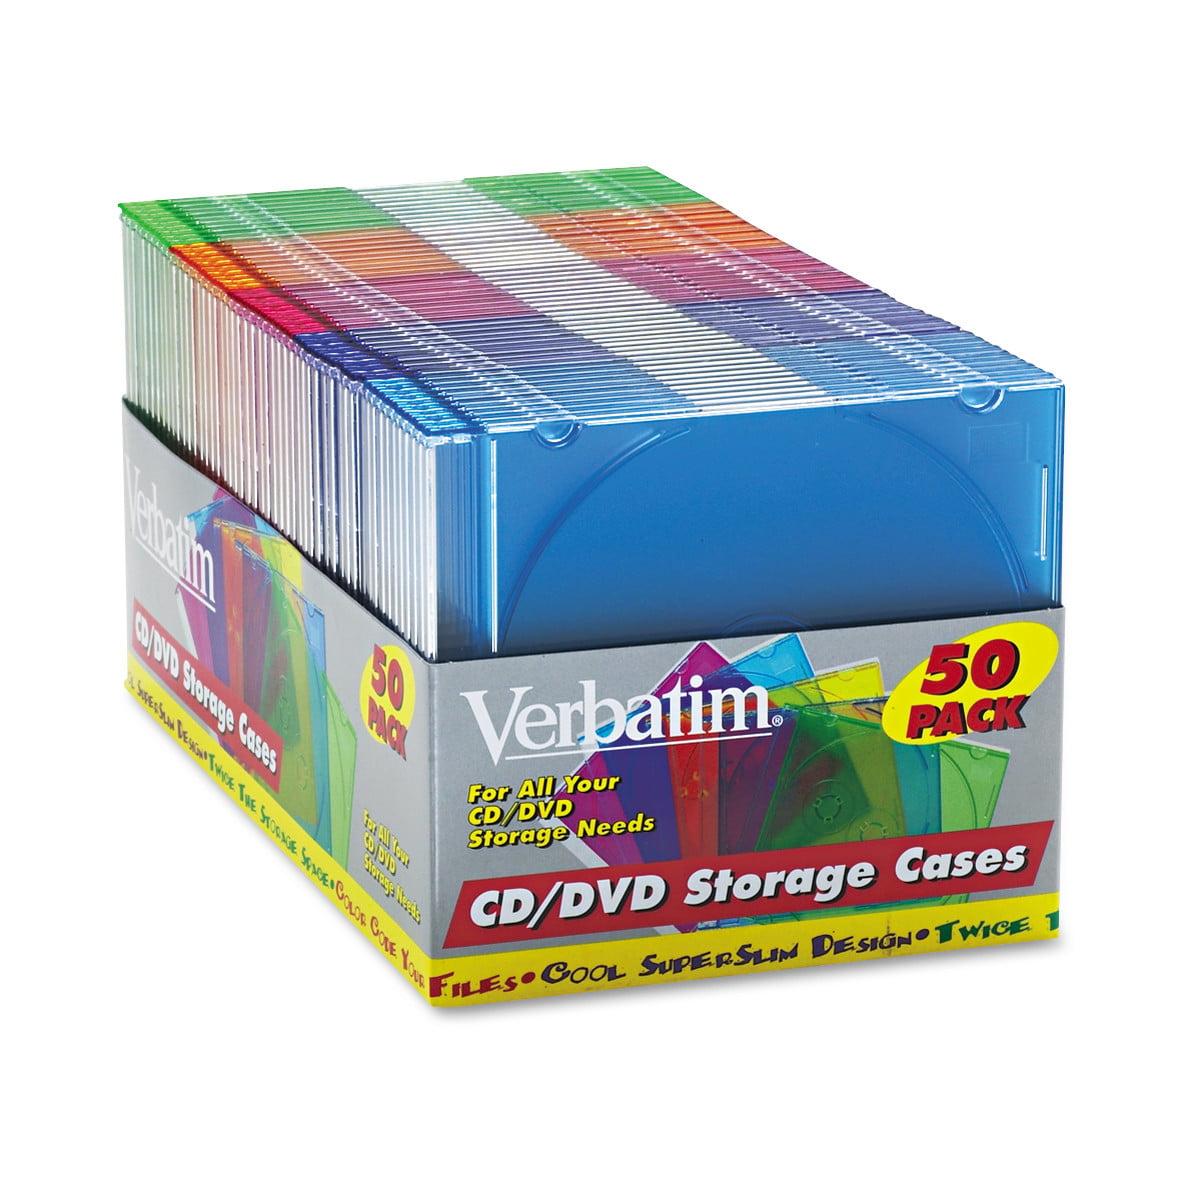 sc 1 st  Walmart & Verbatim 50 Pack CD/DVD Color Slim Jewel Cases Assorted - Walmart.com